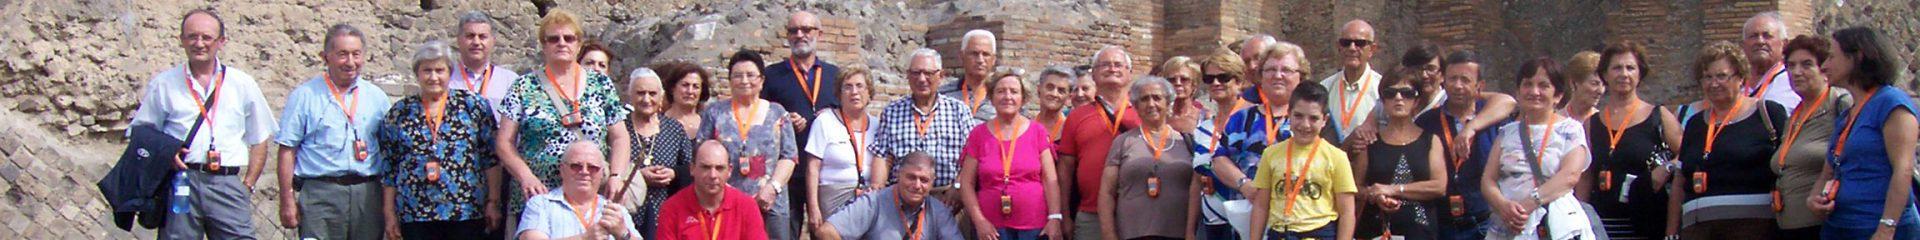 Auser Basilicata